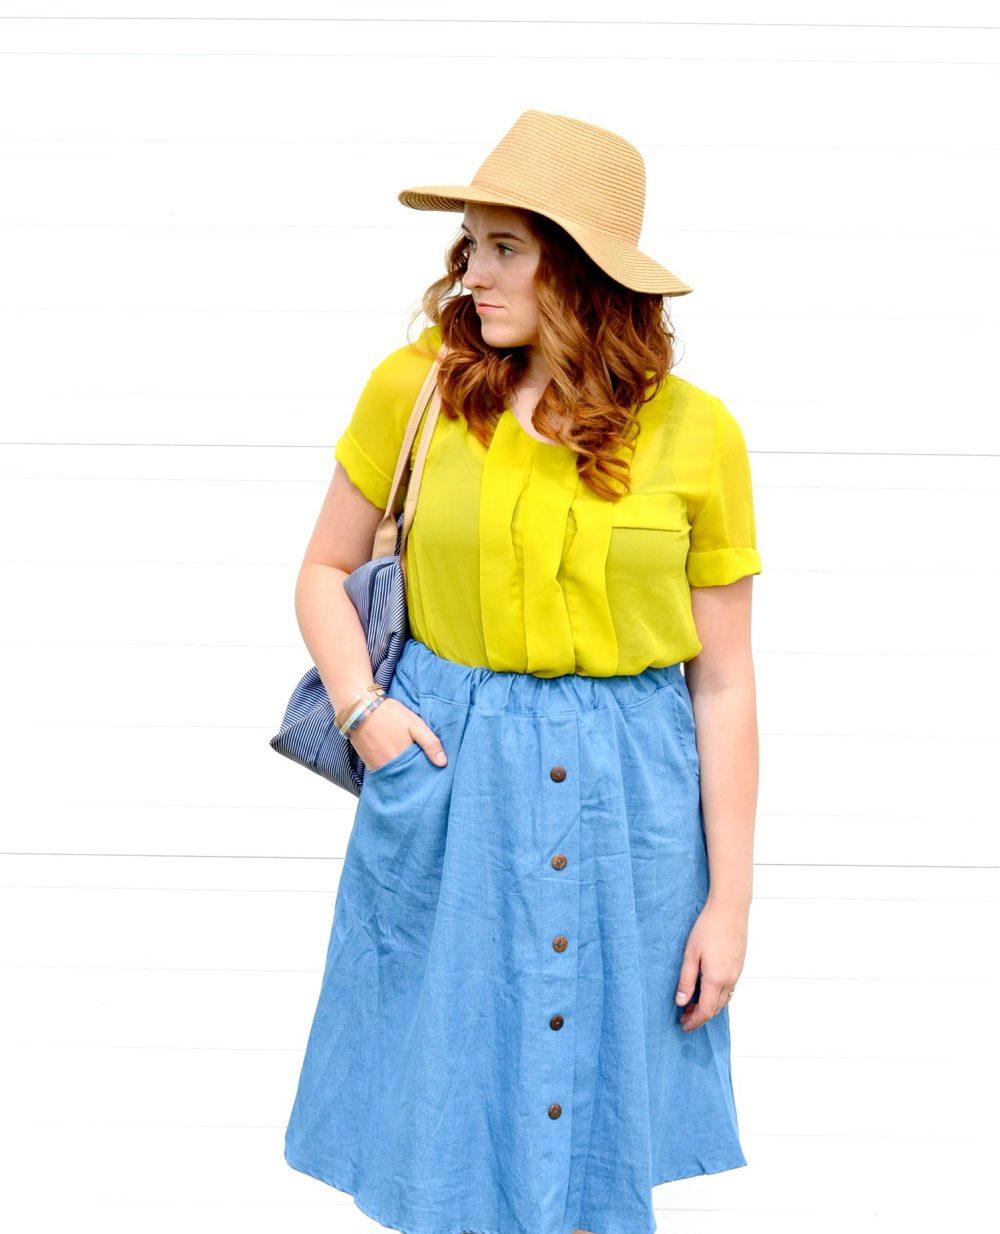 Denim Skirt style, Honey & Betts, Canadian Fashion Blogger